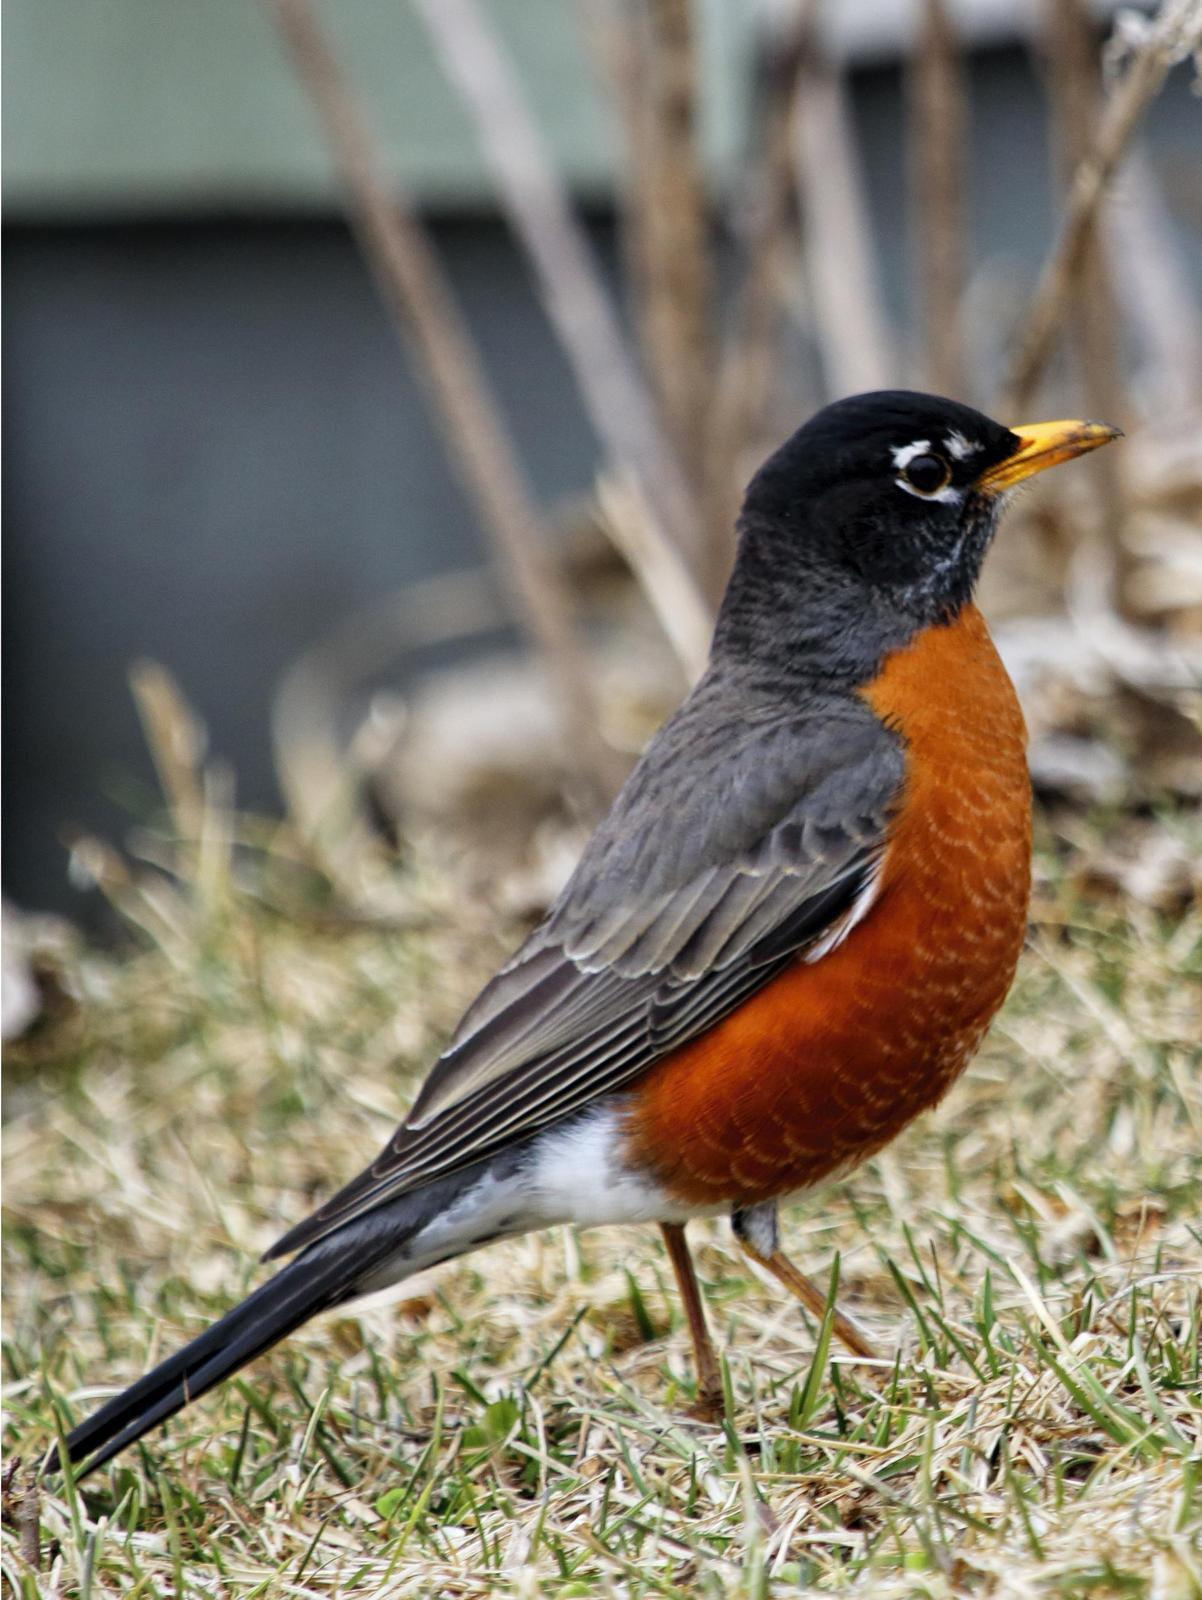 American Robin Photo by Dan Tallman